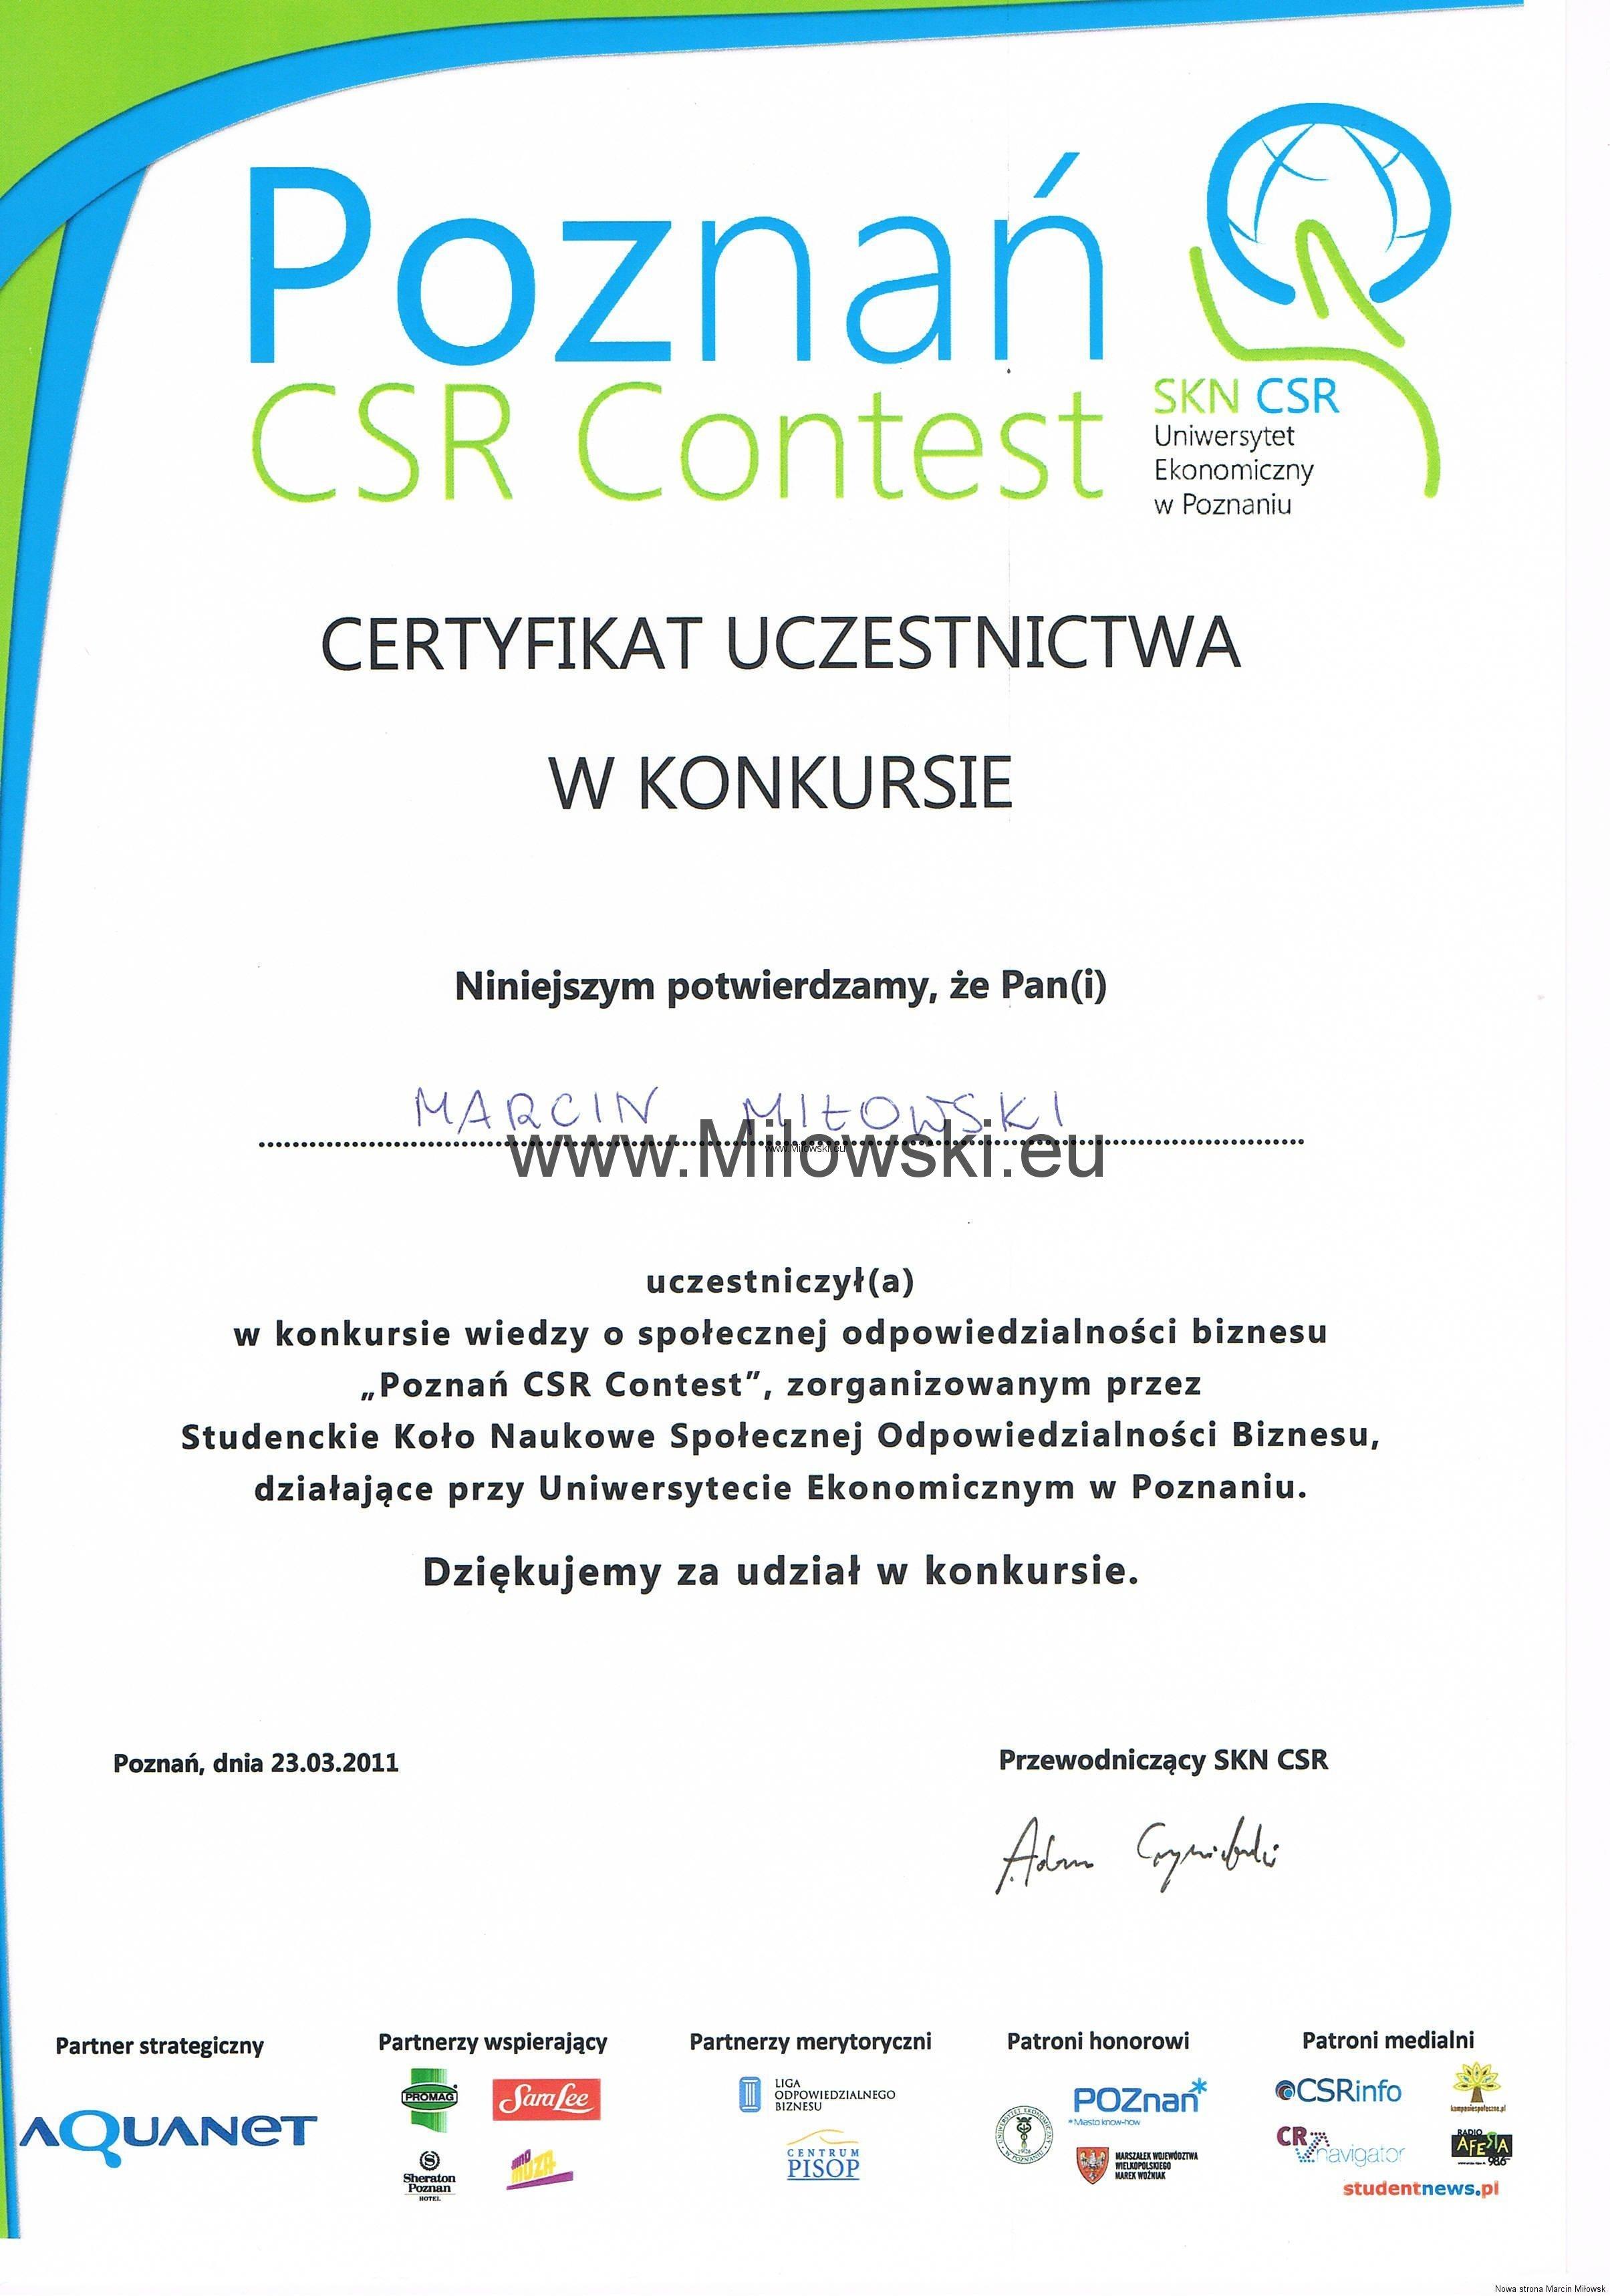 ccf20130112_00012